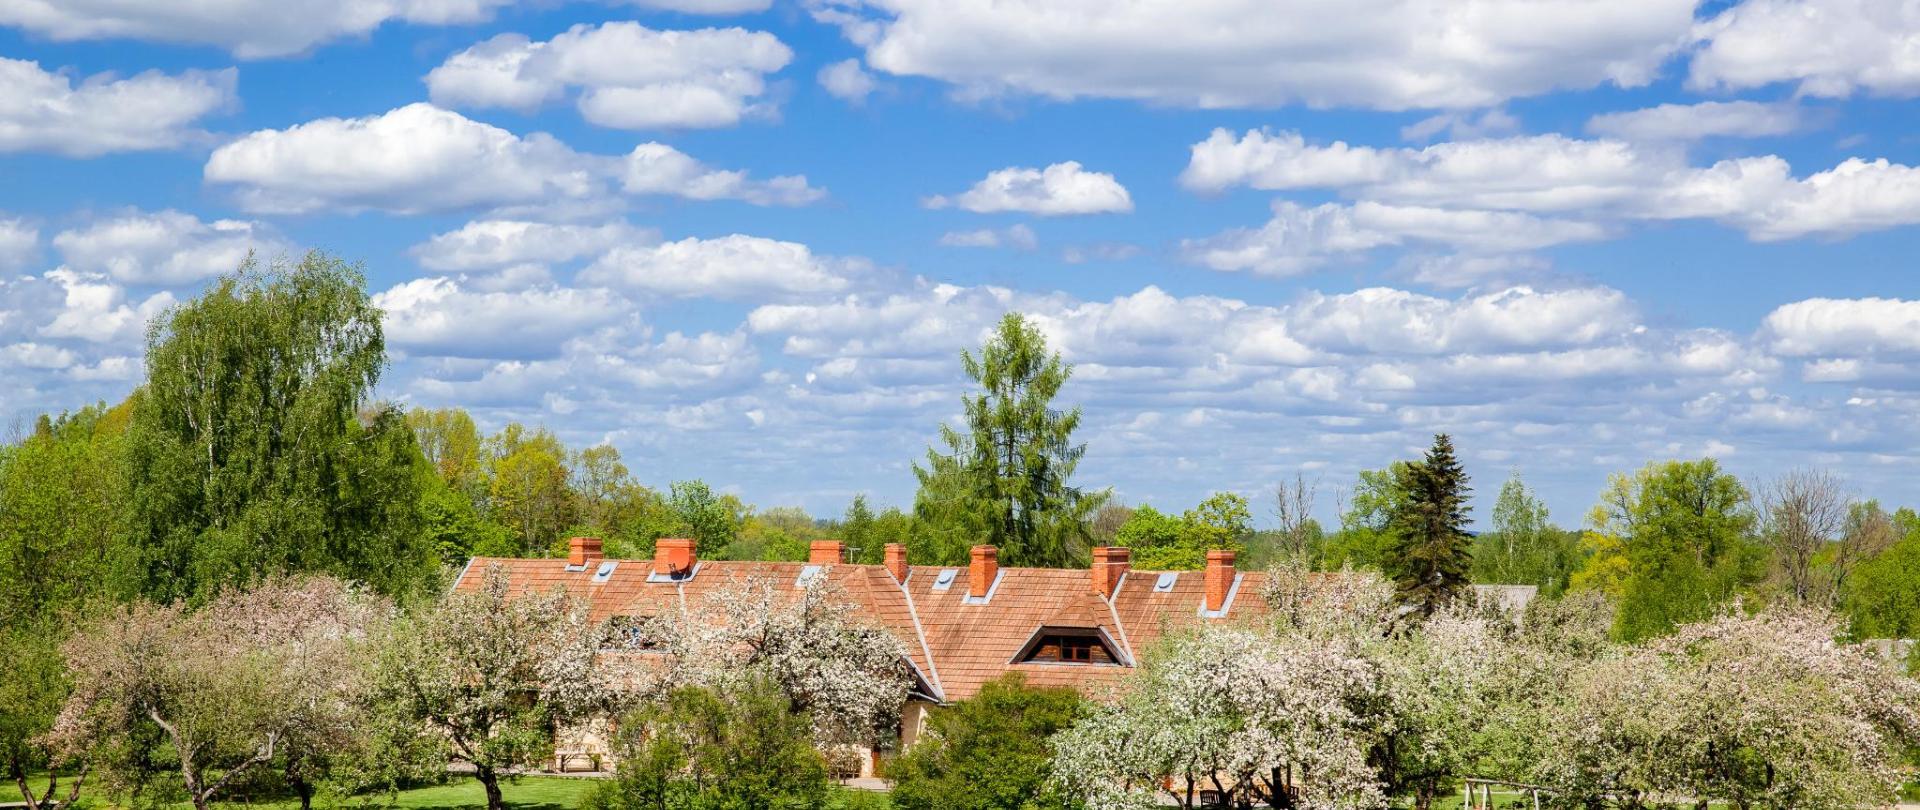 Яблоневый сад «Karlamuiza Country Hotel»